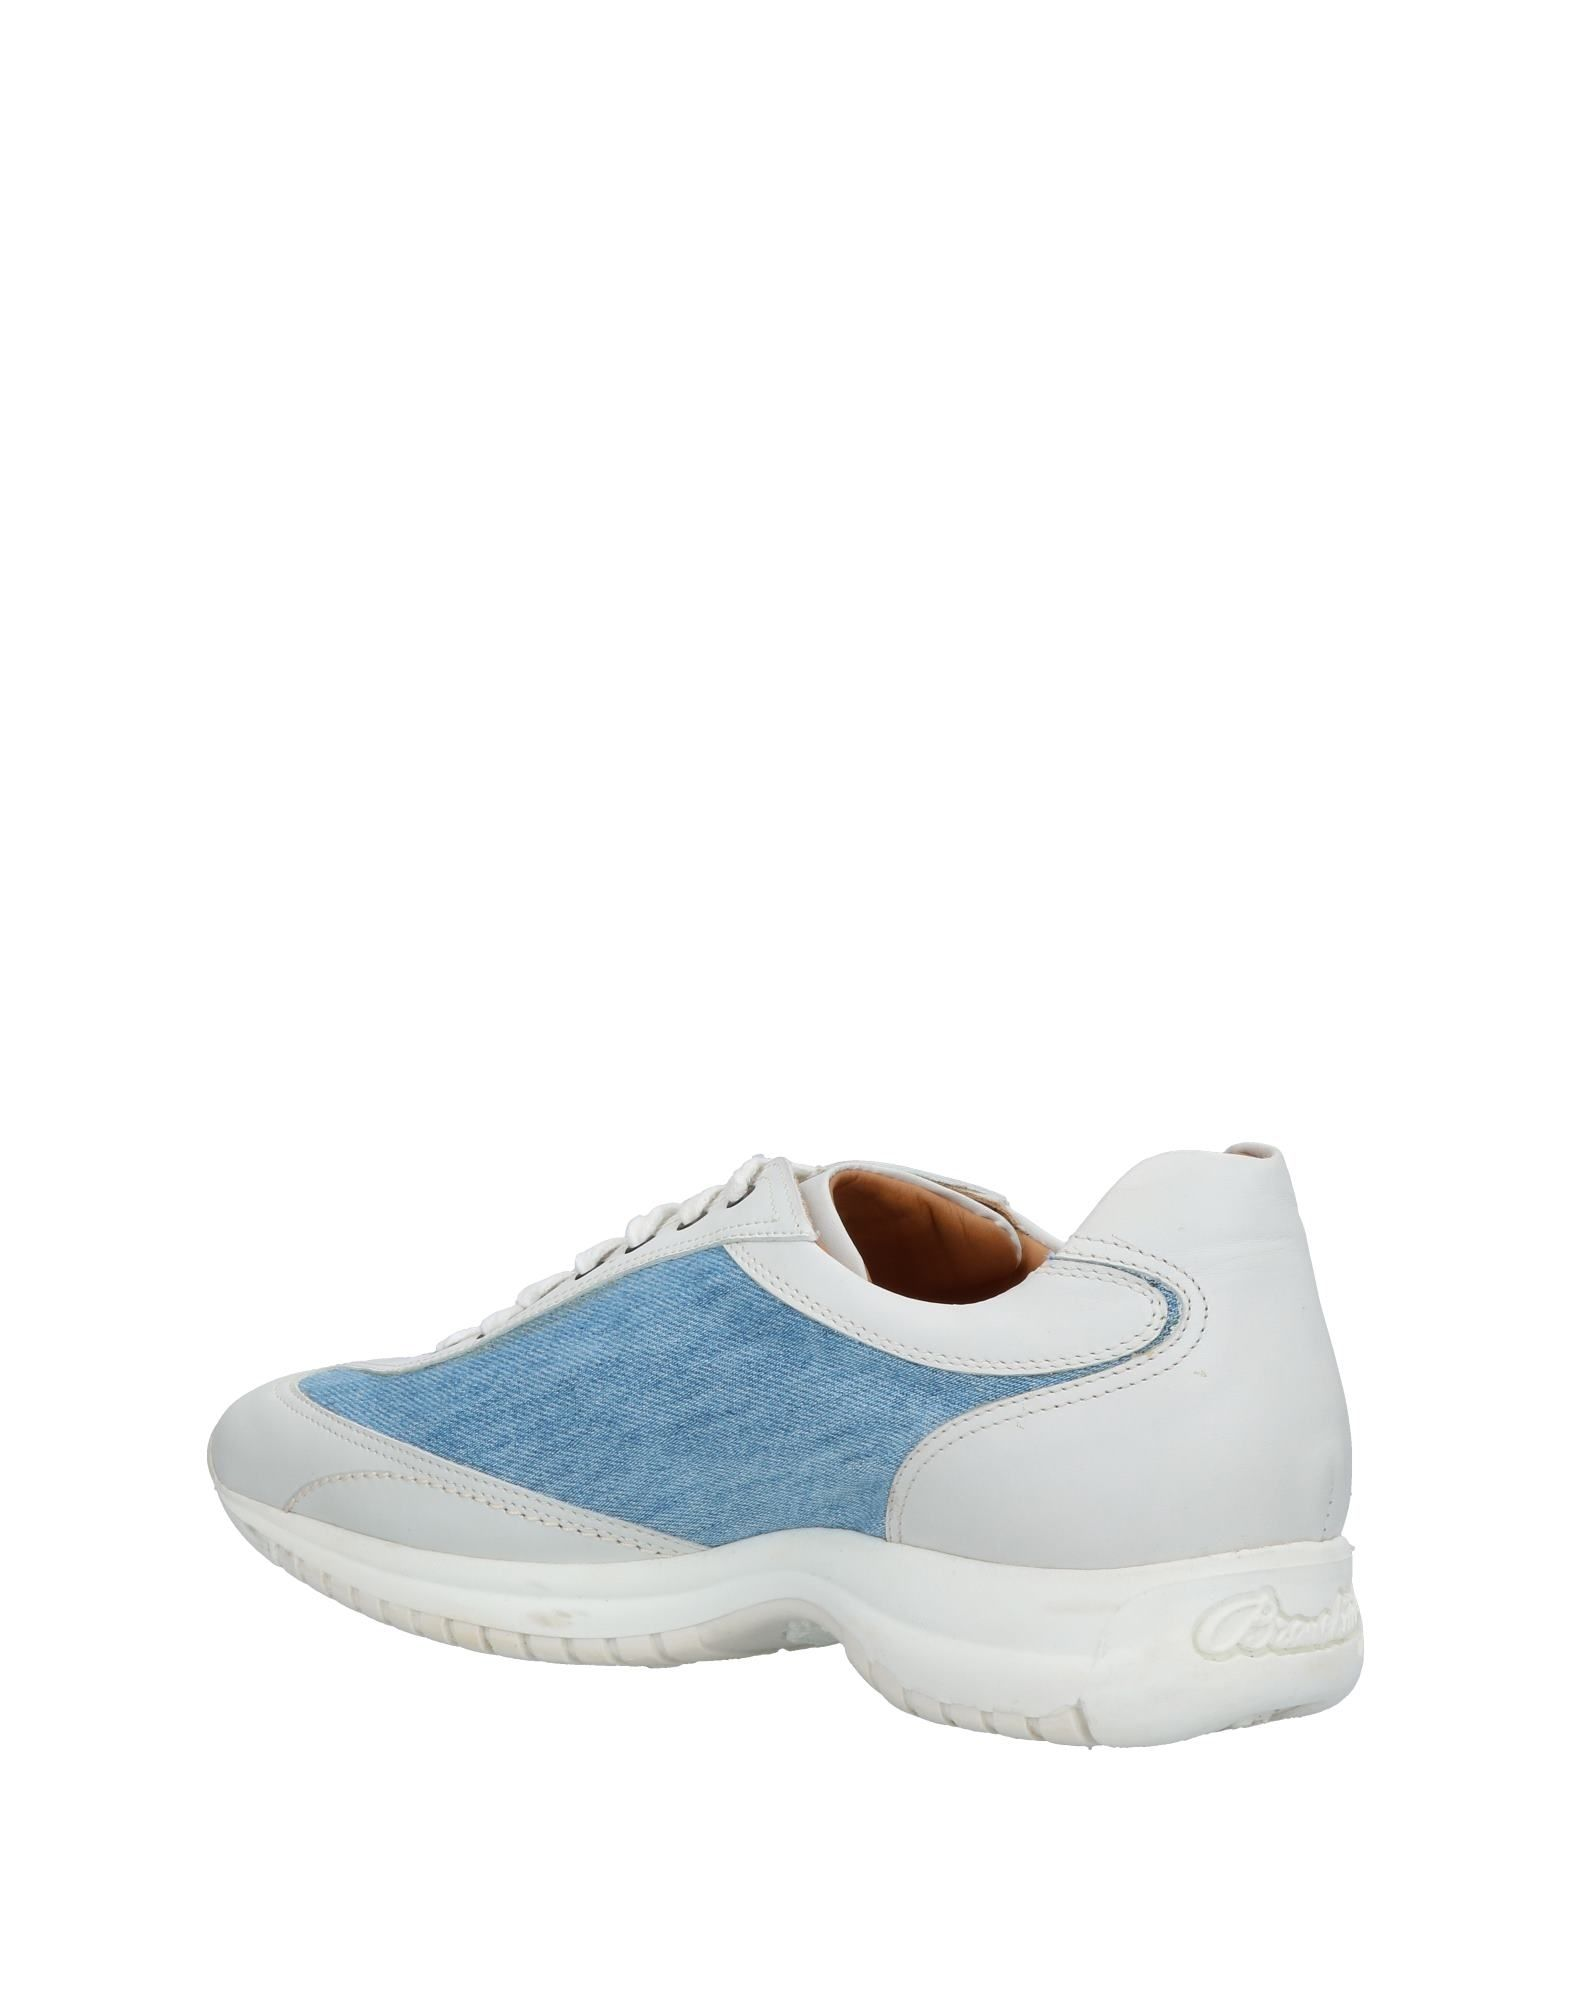 Rabatt echte Schuhe Sneakers Trofeo By Stefano Branchini Sneakers Schuhe Herren  11381816LO 3c61fd